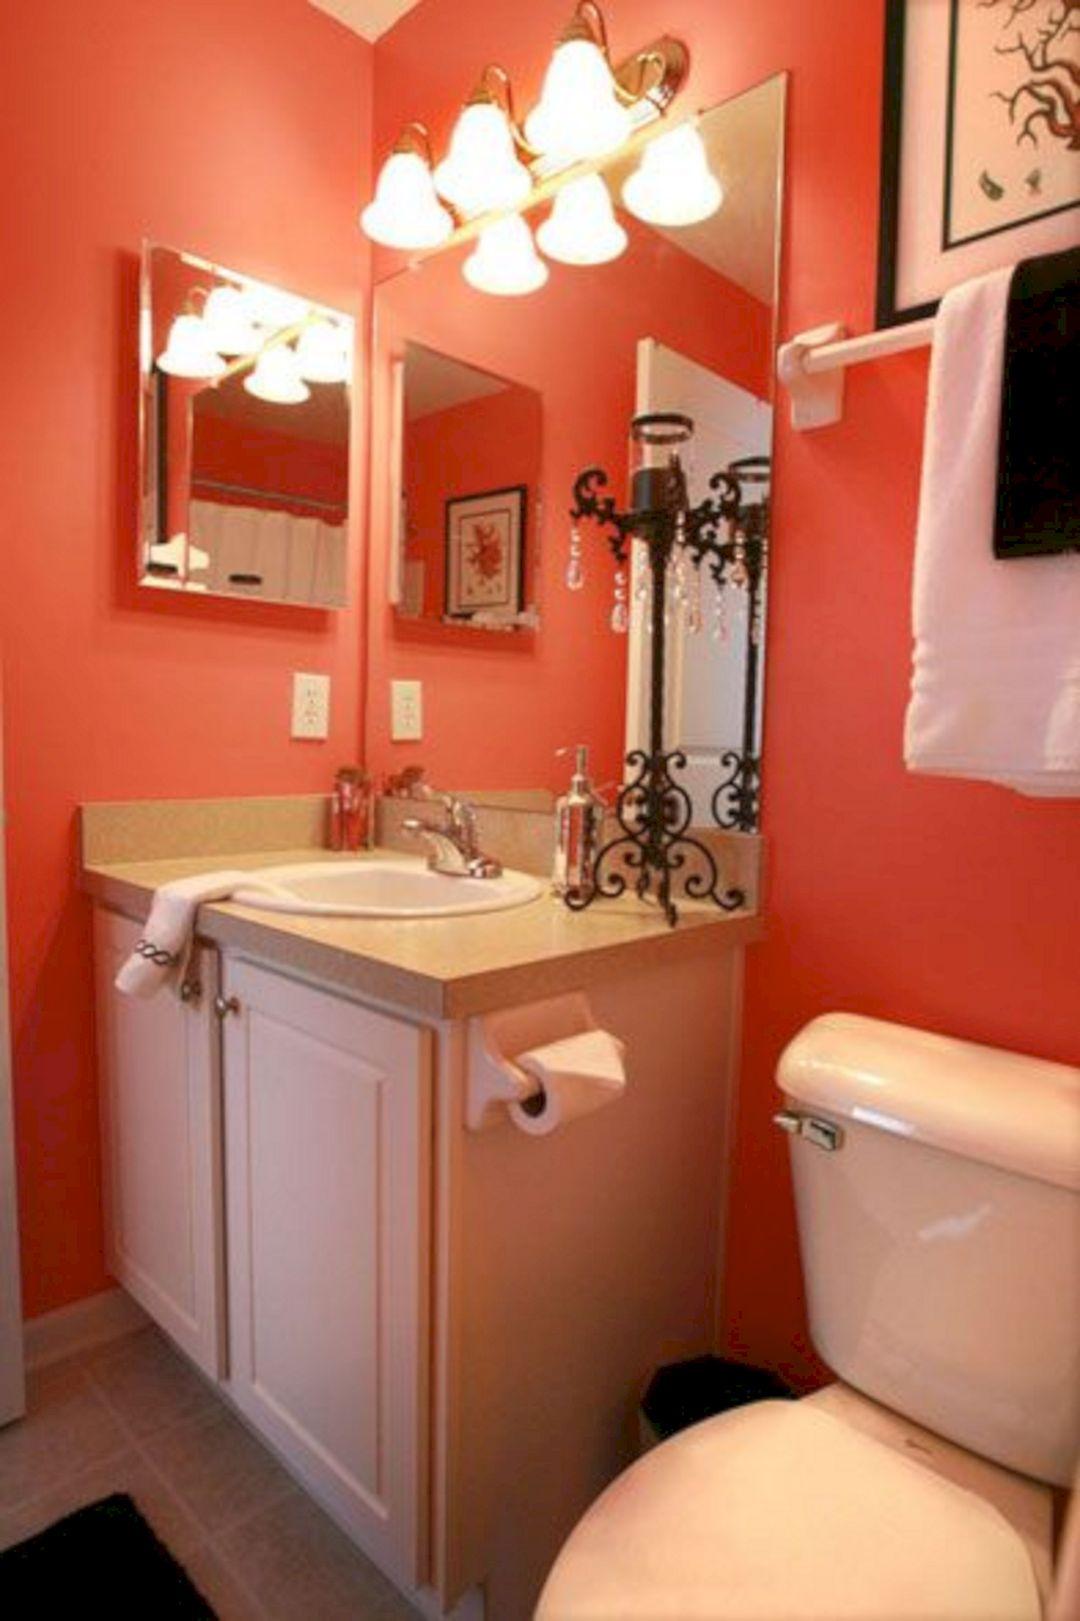 Teal And Coral Bathroom Decor 17 Teal And Coral Bathroom Decor 17 Design Ideas And Photos